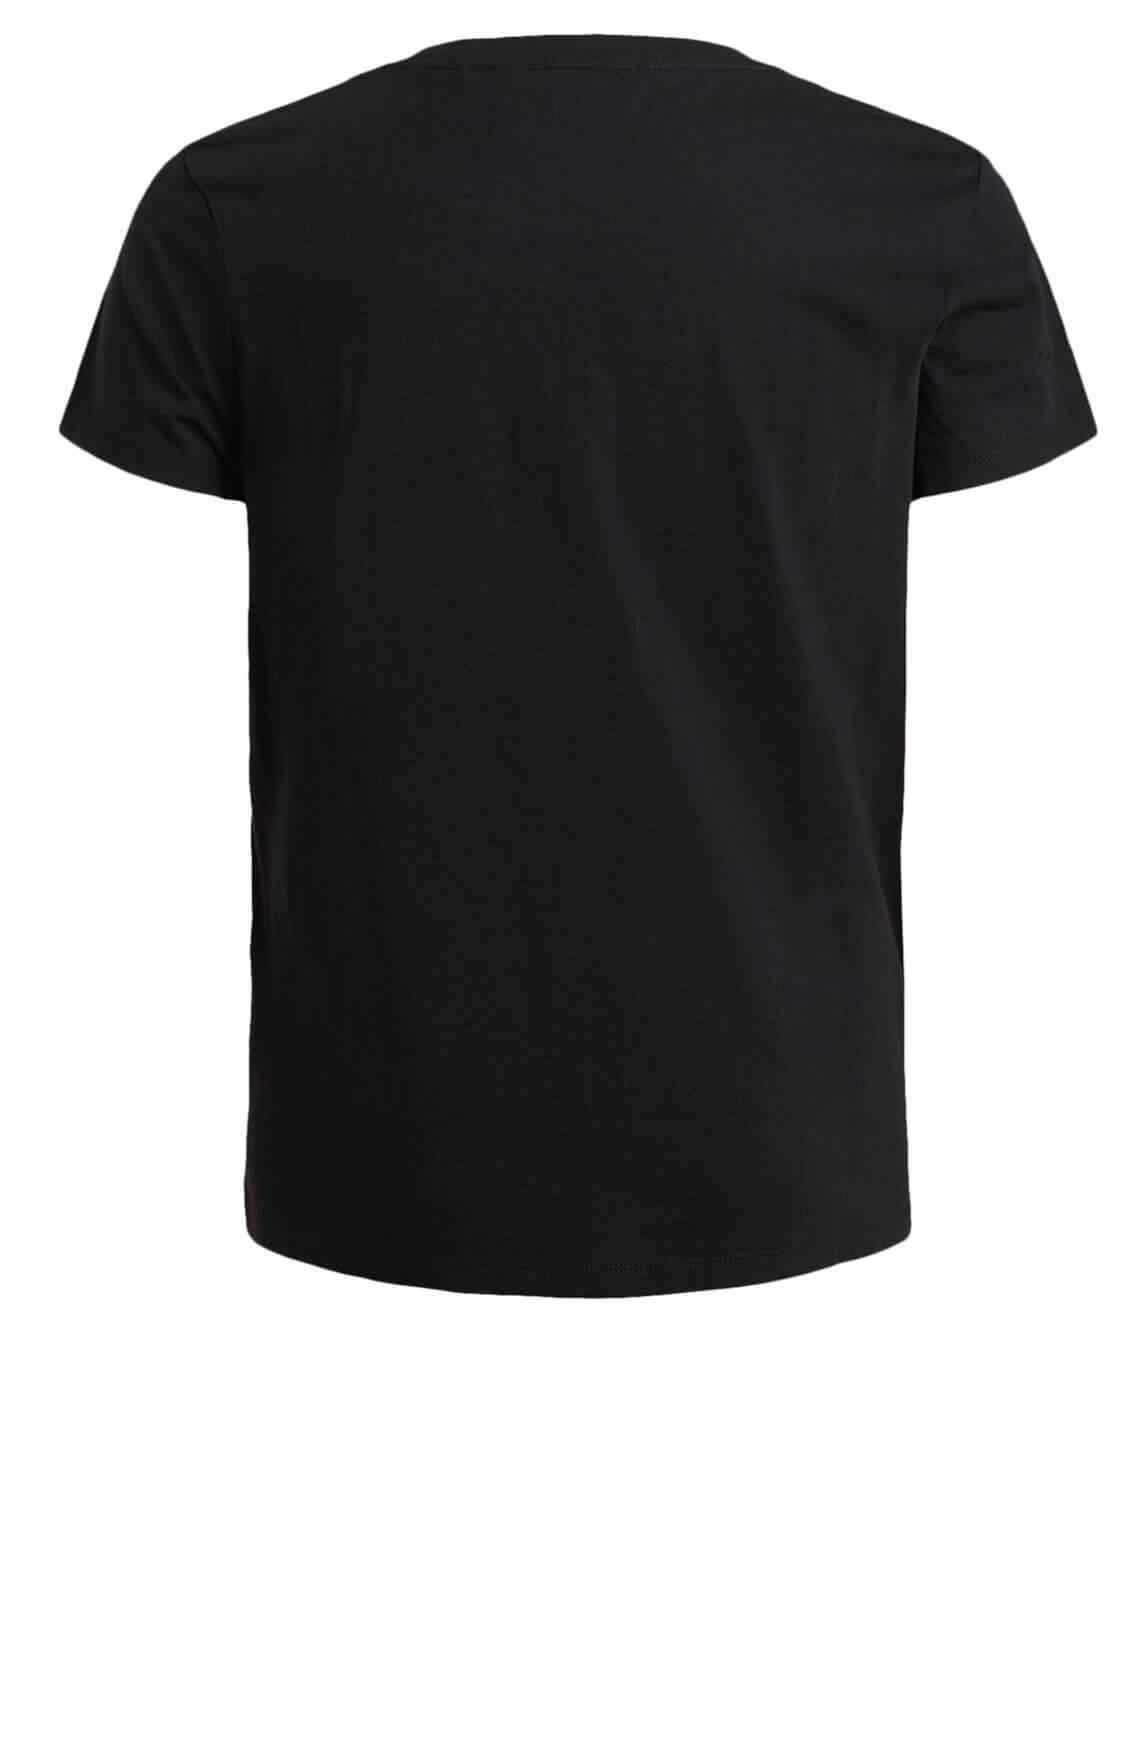 Levi s Dames Shirt met tekst opdruk zwart